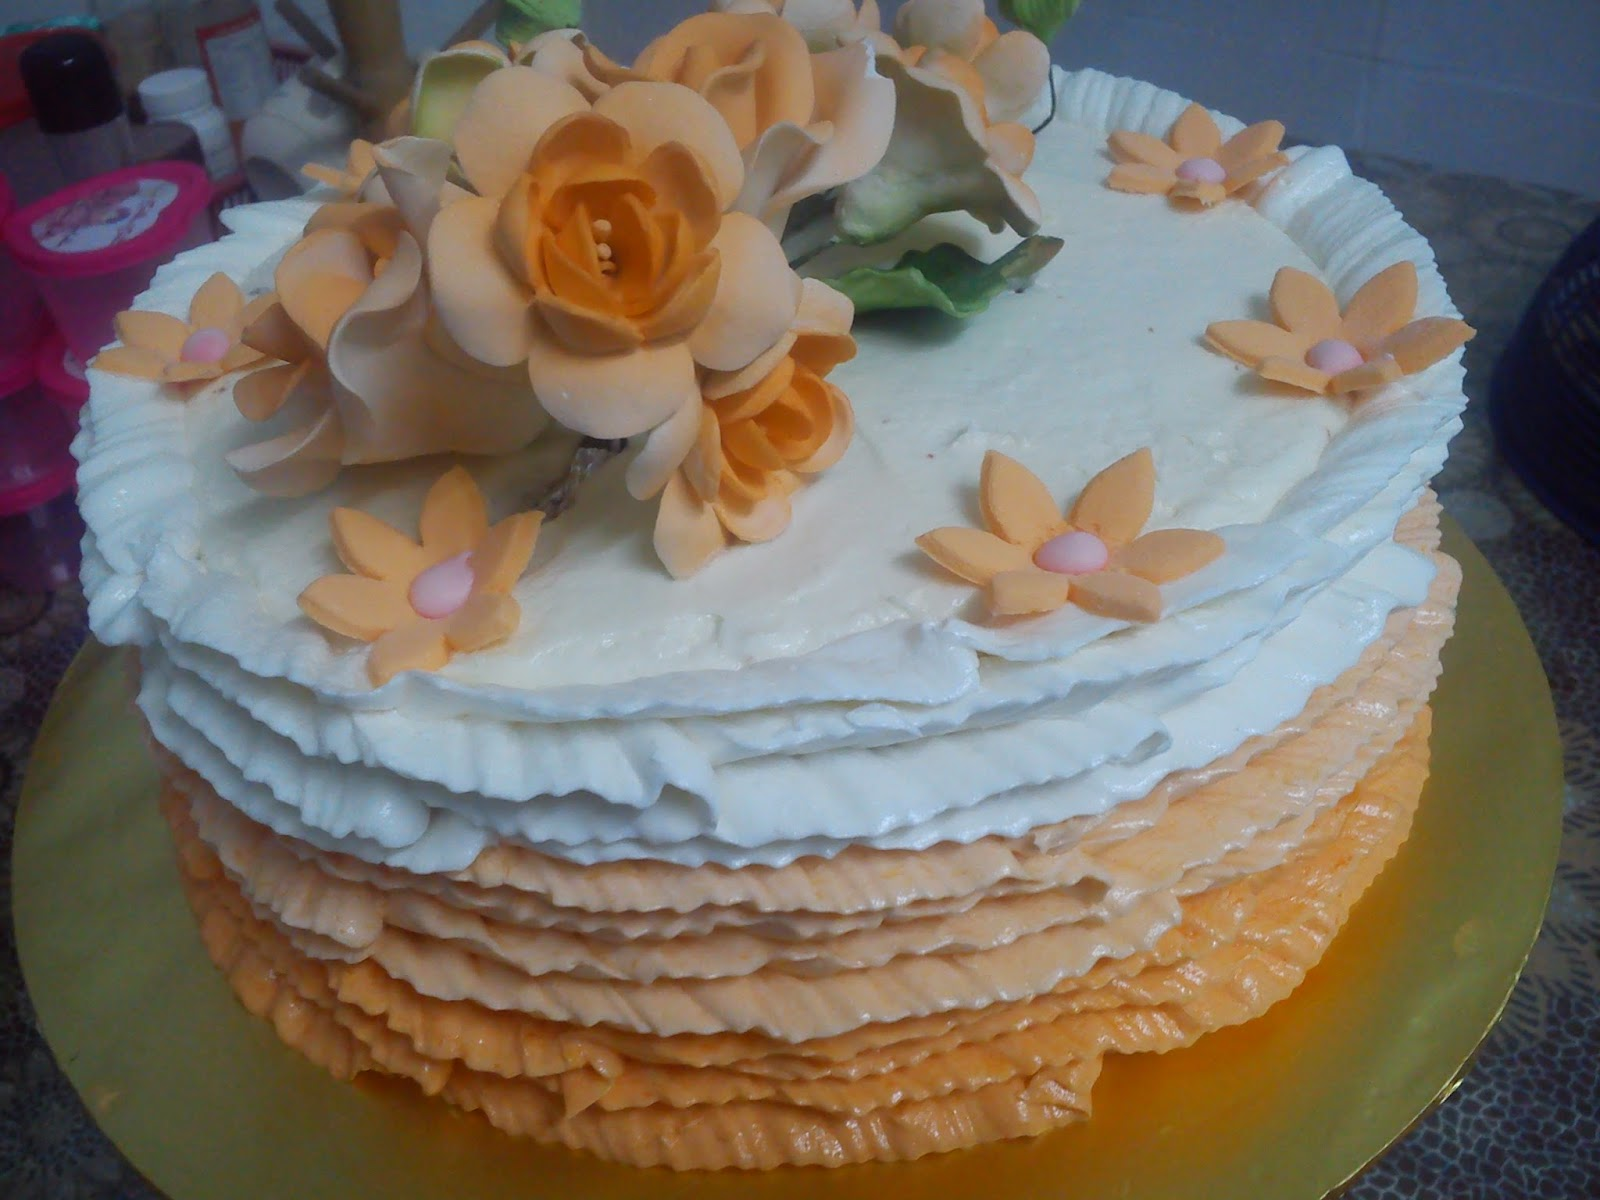 azreen zunairah ruffle ombre cake first time buat corak ropol